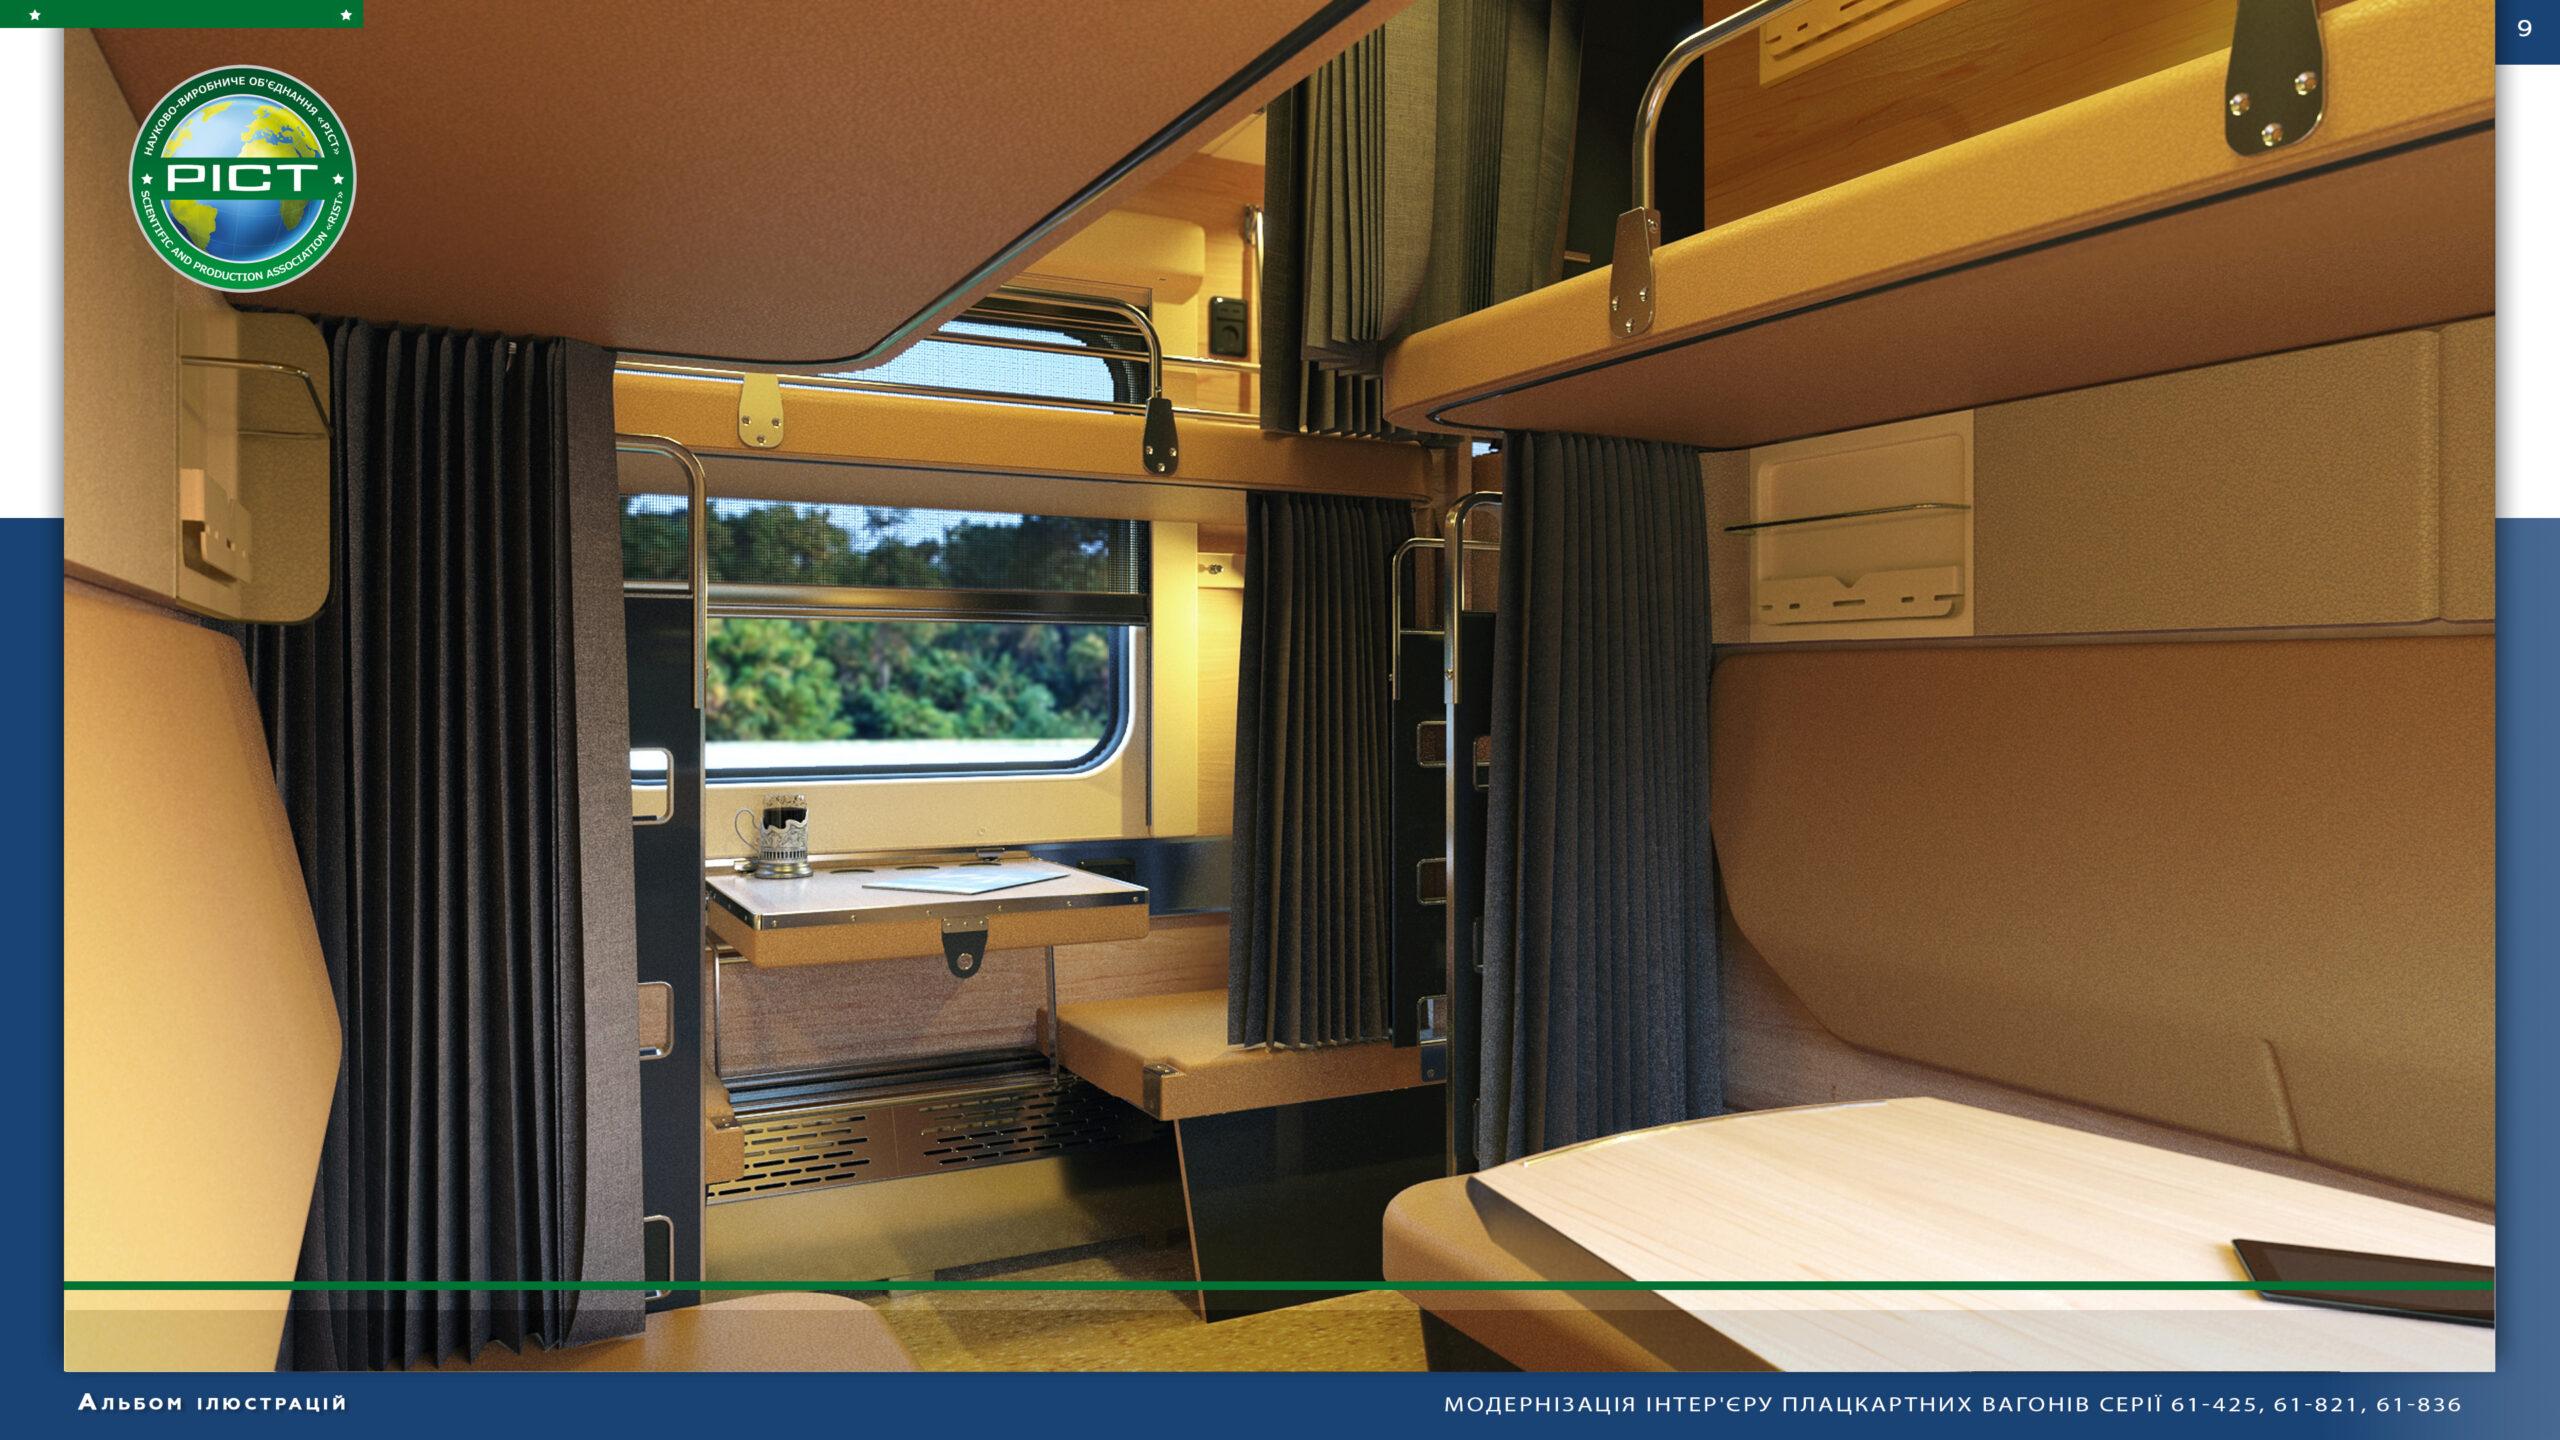 Modernization of the interior of econom-class train